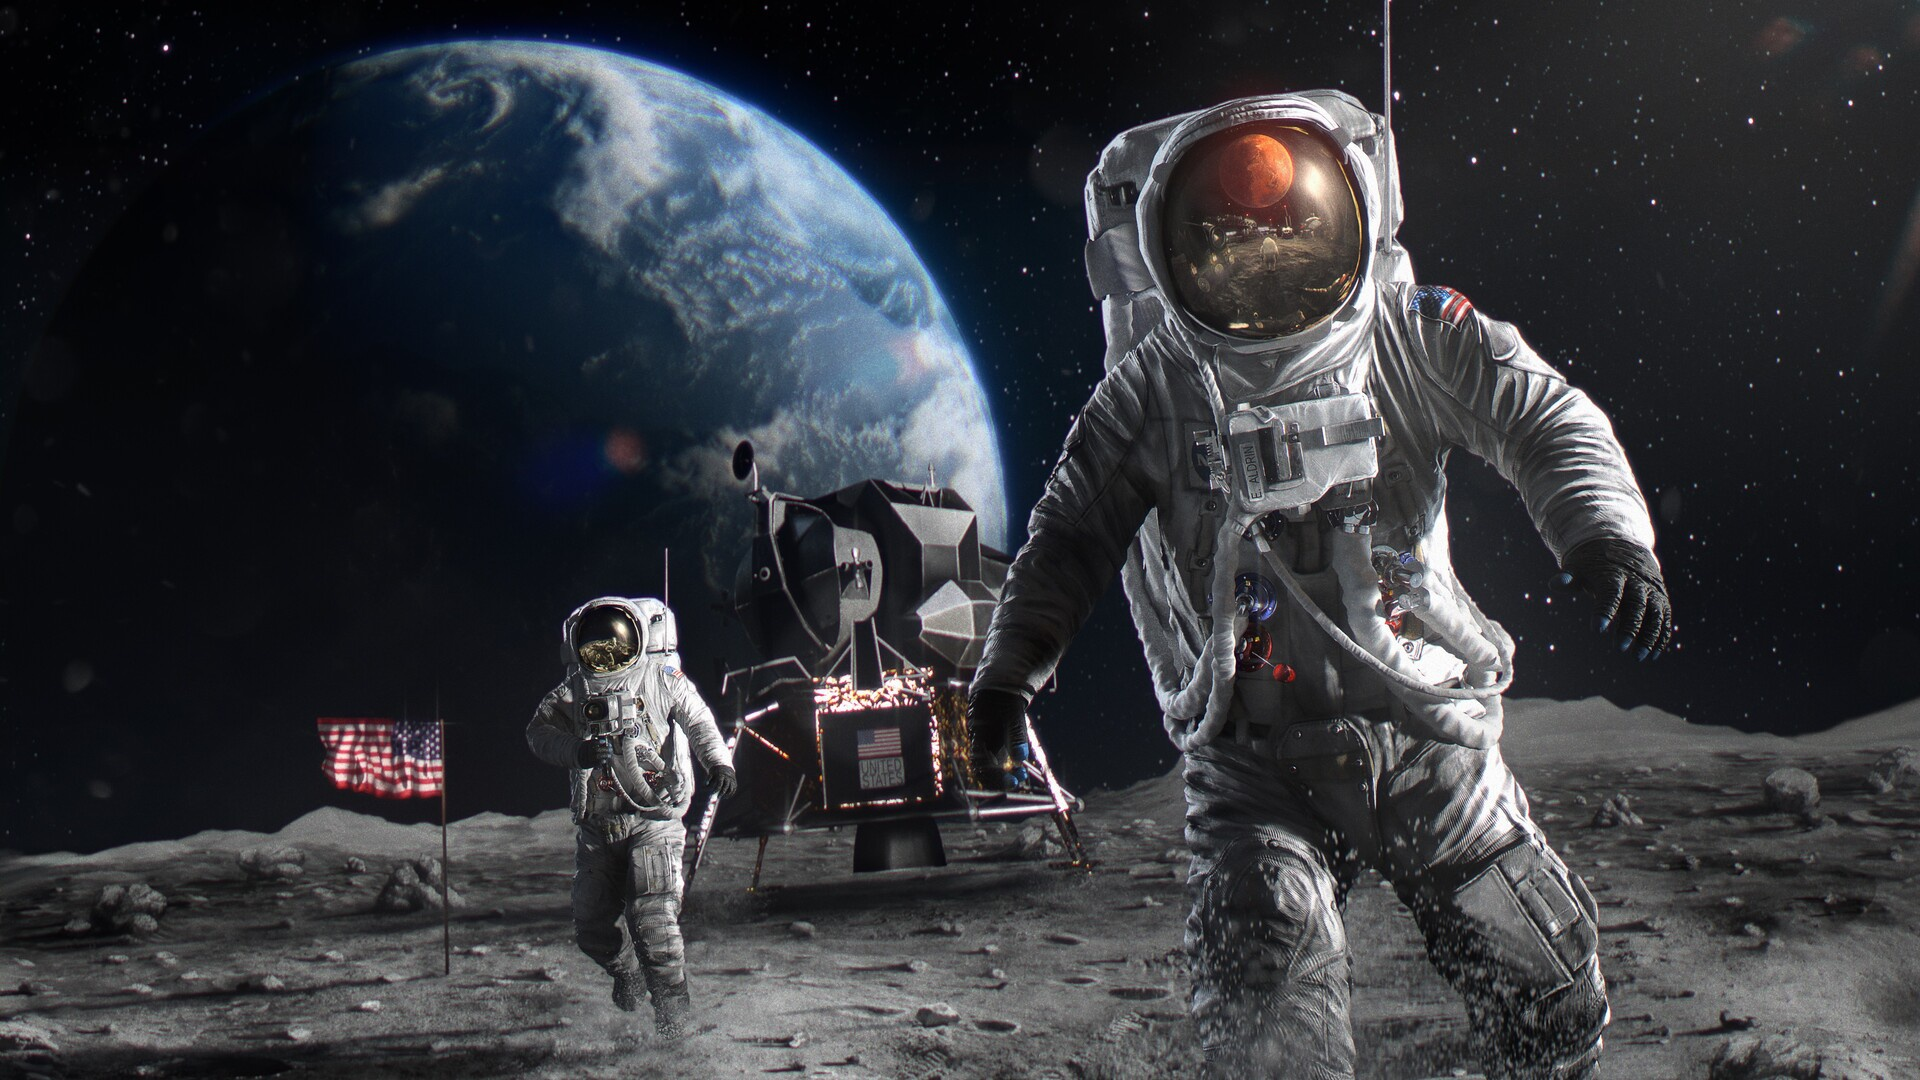 Astronaut In Space Art , HD Wallpaper & Backgrounds